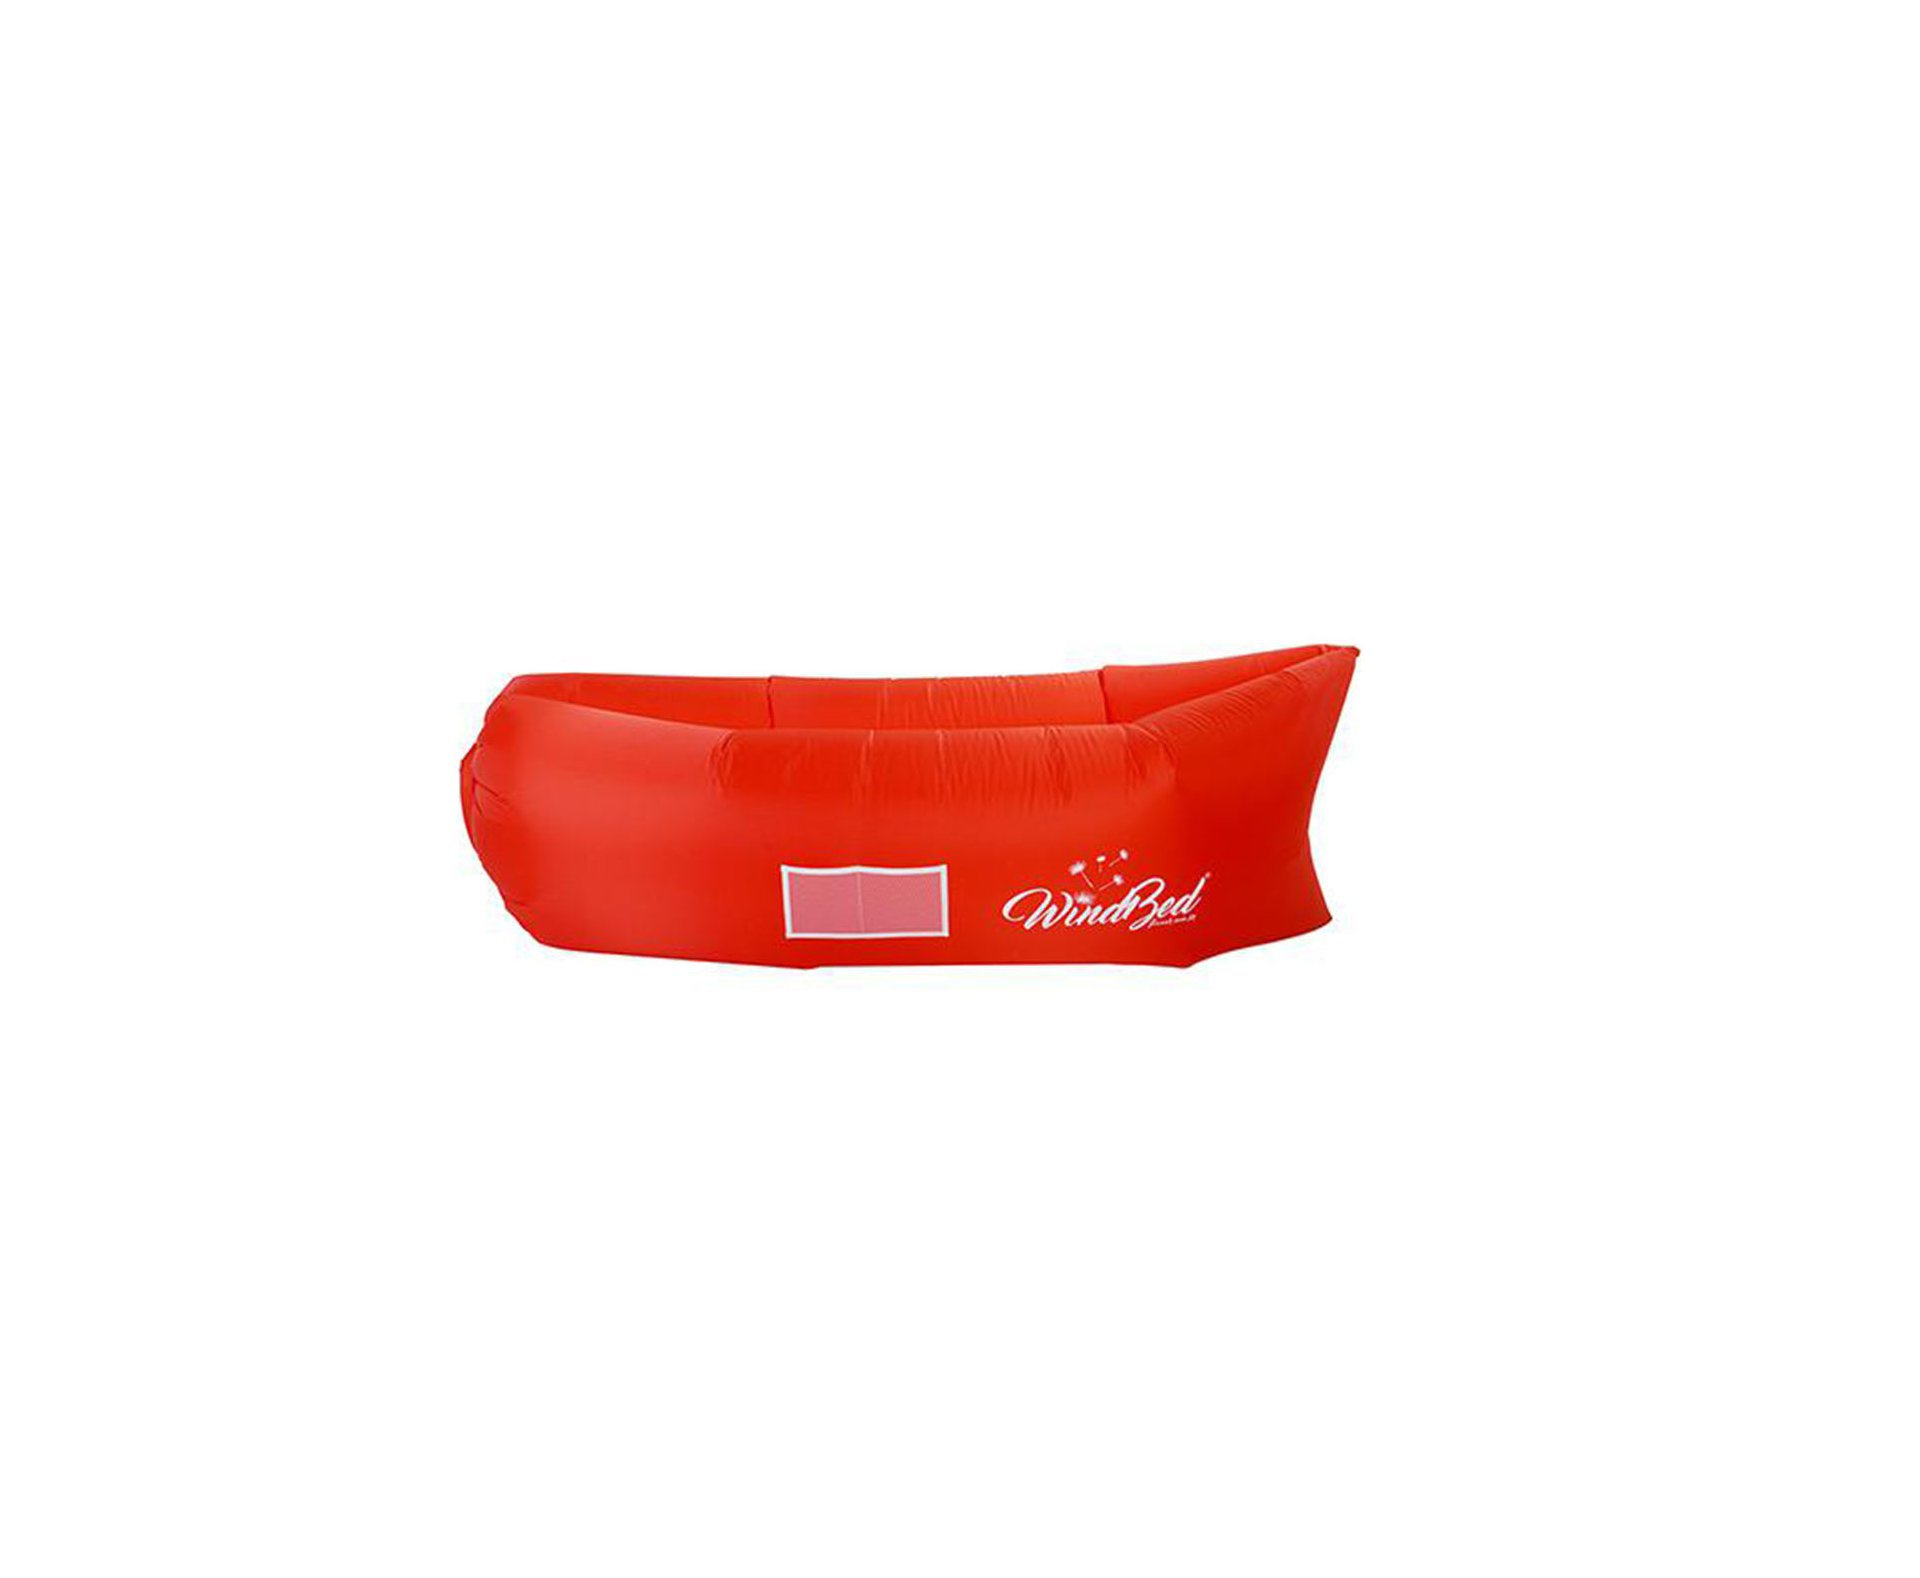 Windbed Sofá Inflável  Vermelho - Fixxar